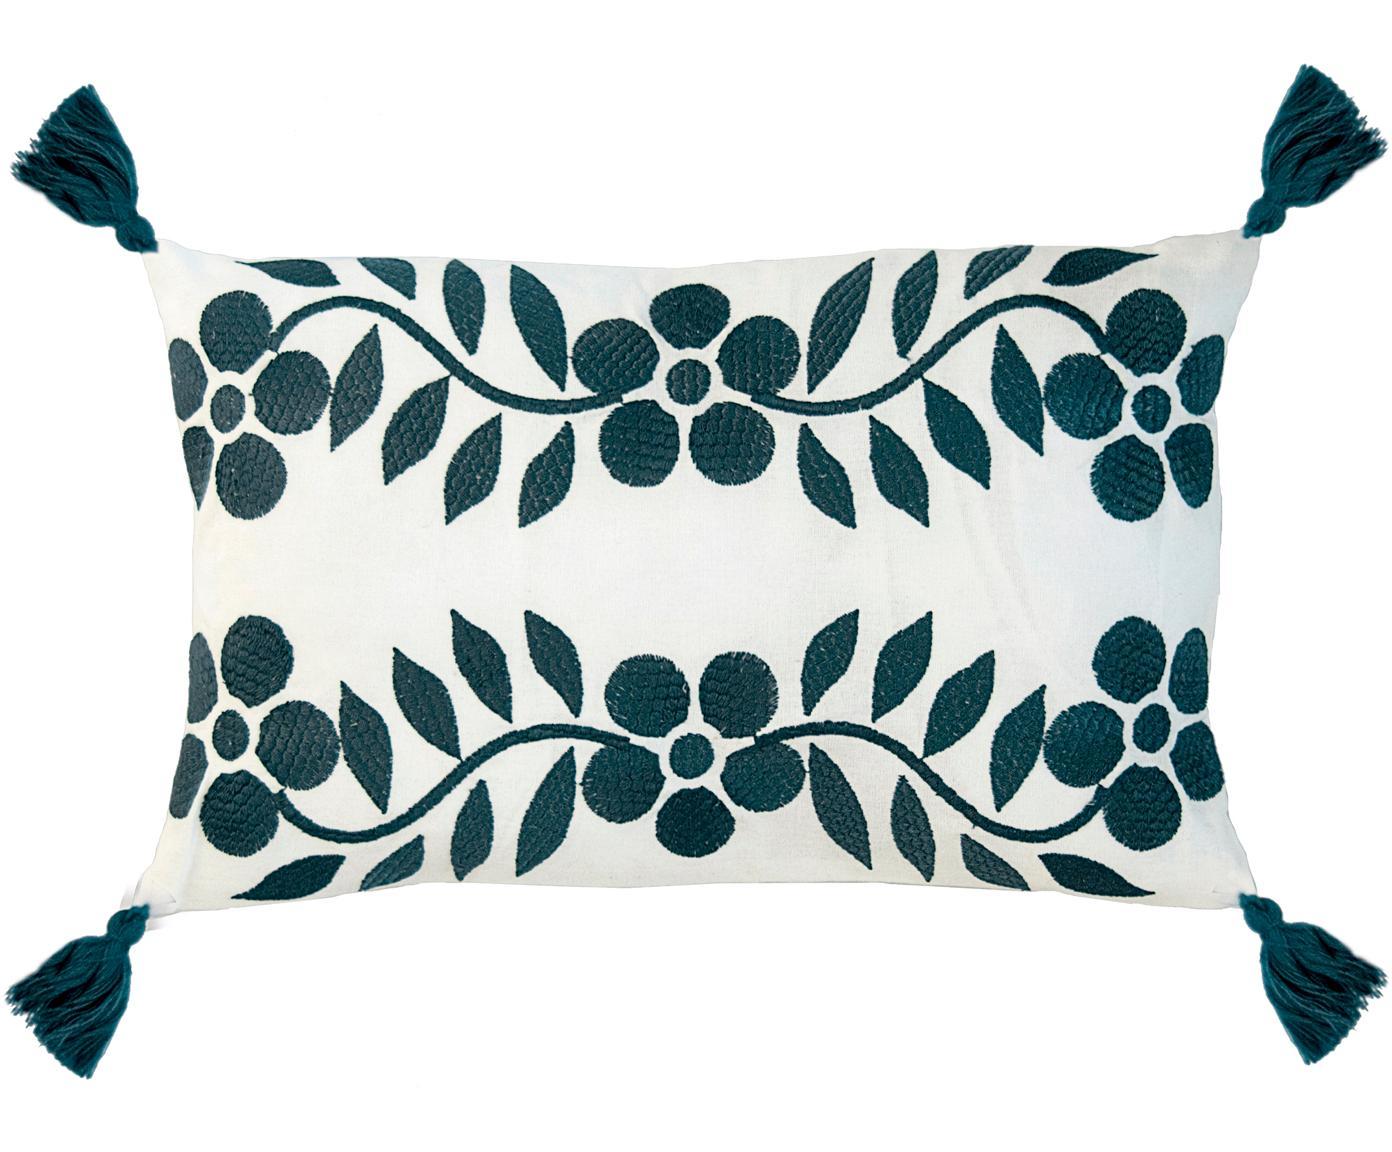 Federa arredo con ricami e nappe Matisse, Cotone, Bianco, blu navy, Larg. 30 x Alt. 50 cm